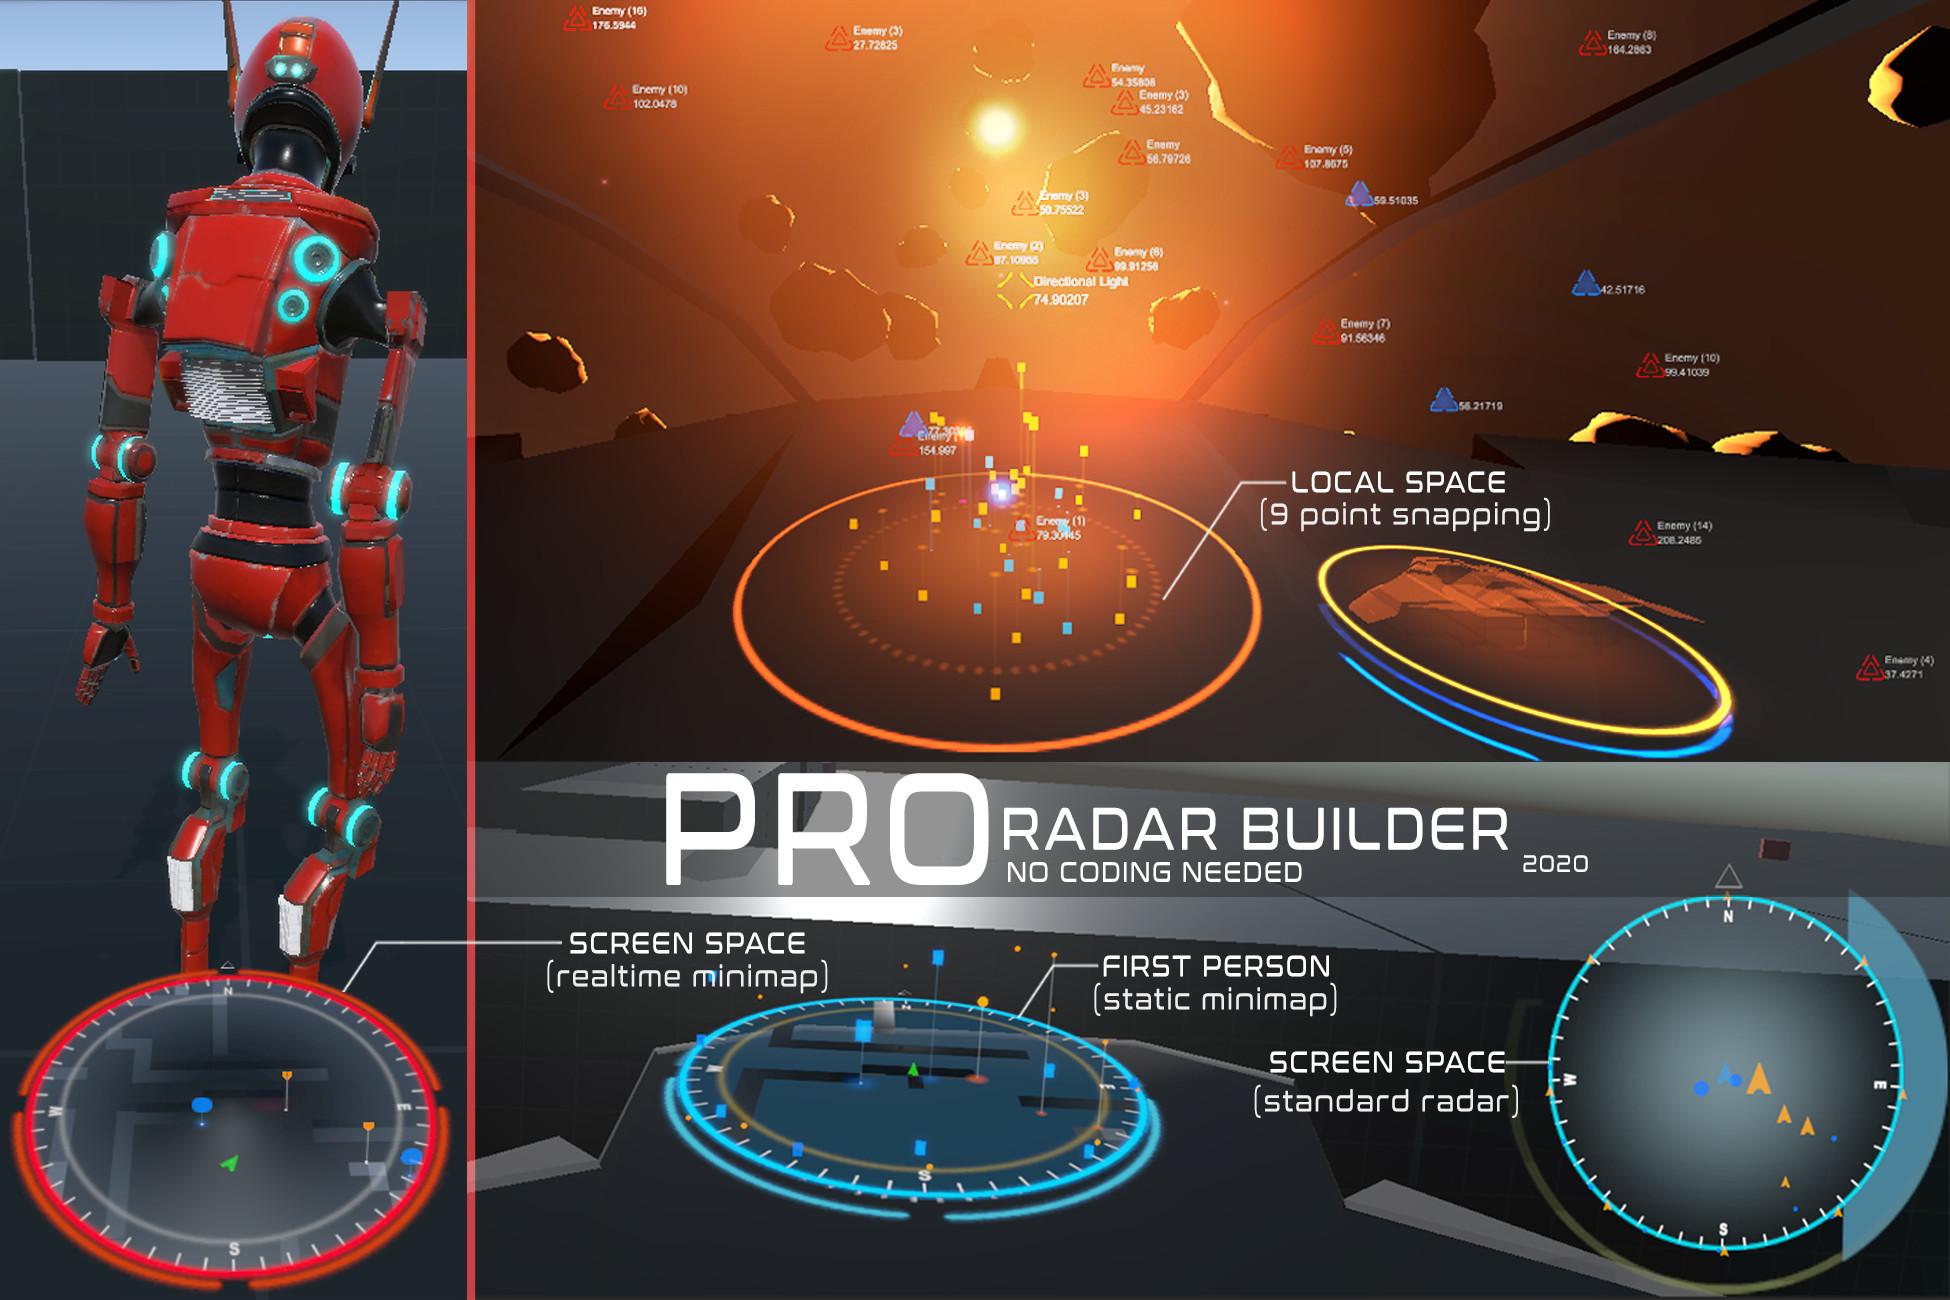 Pro Radar Builder